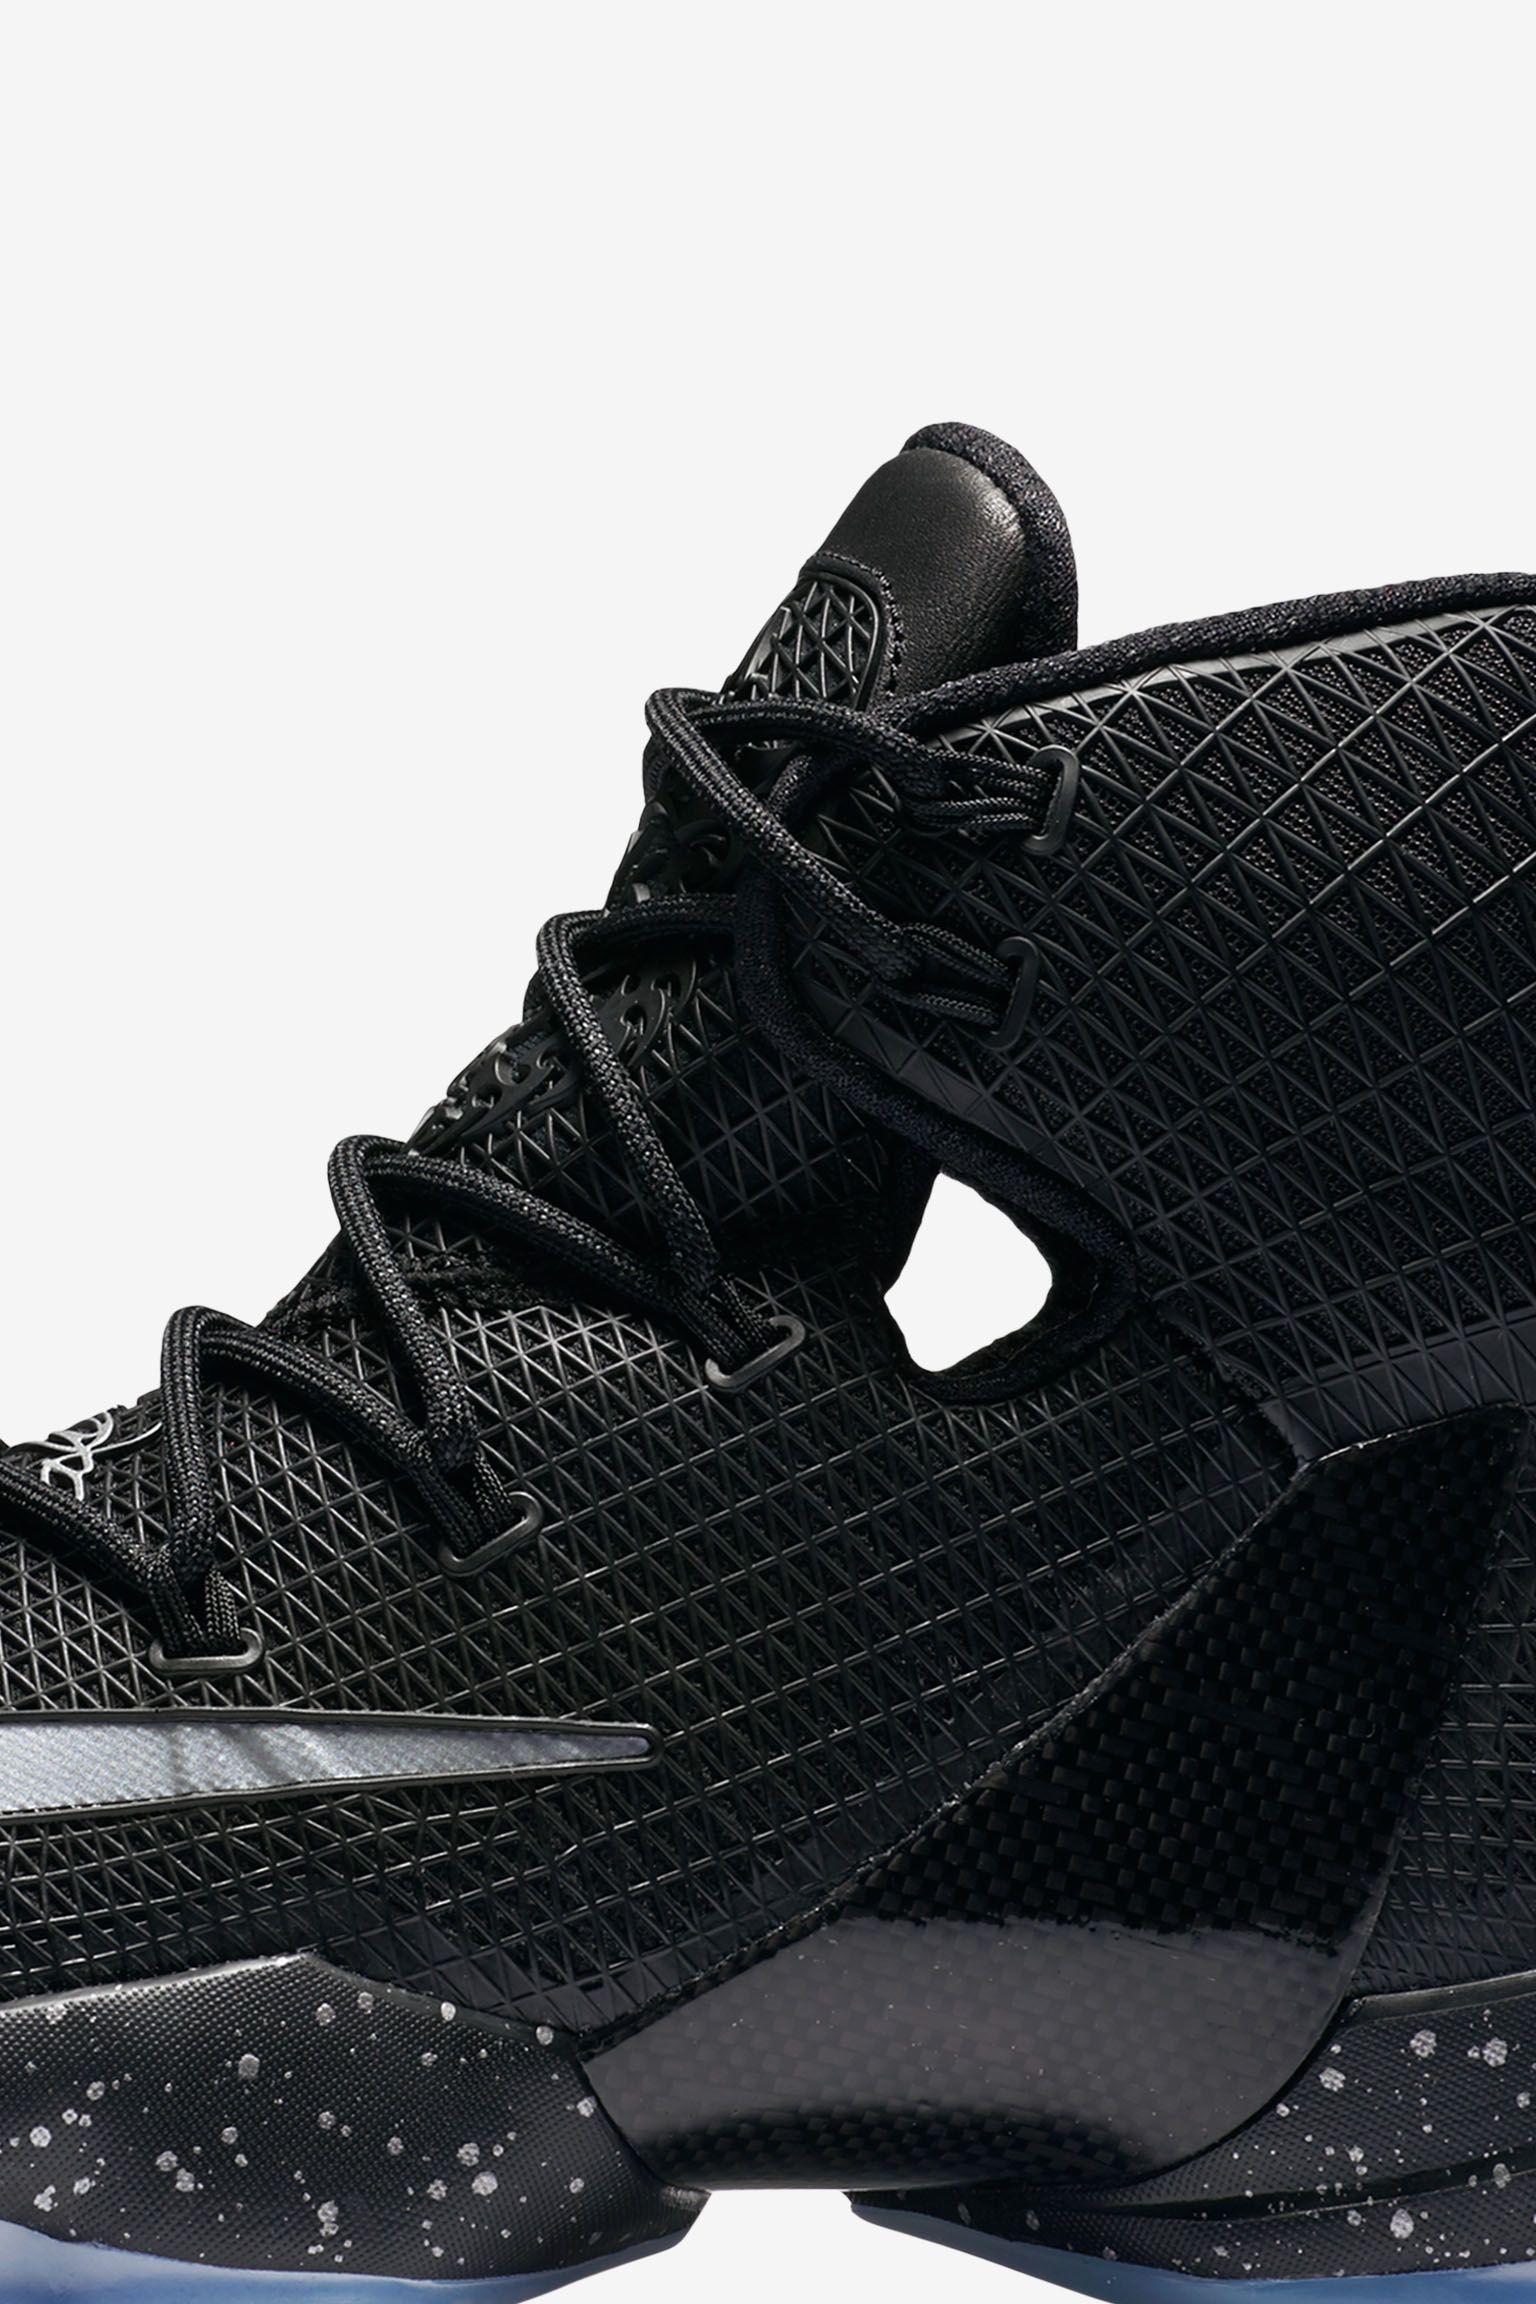 free shipping a2fef 98ec4 Nike Lebron 13 Elite  Ready To Battle  Release Date